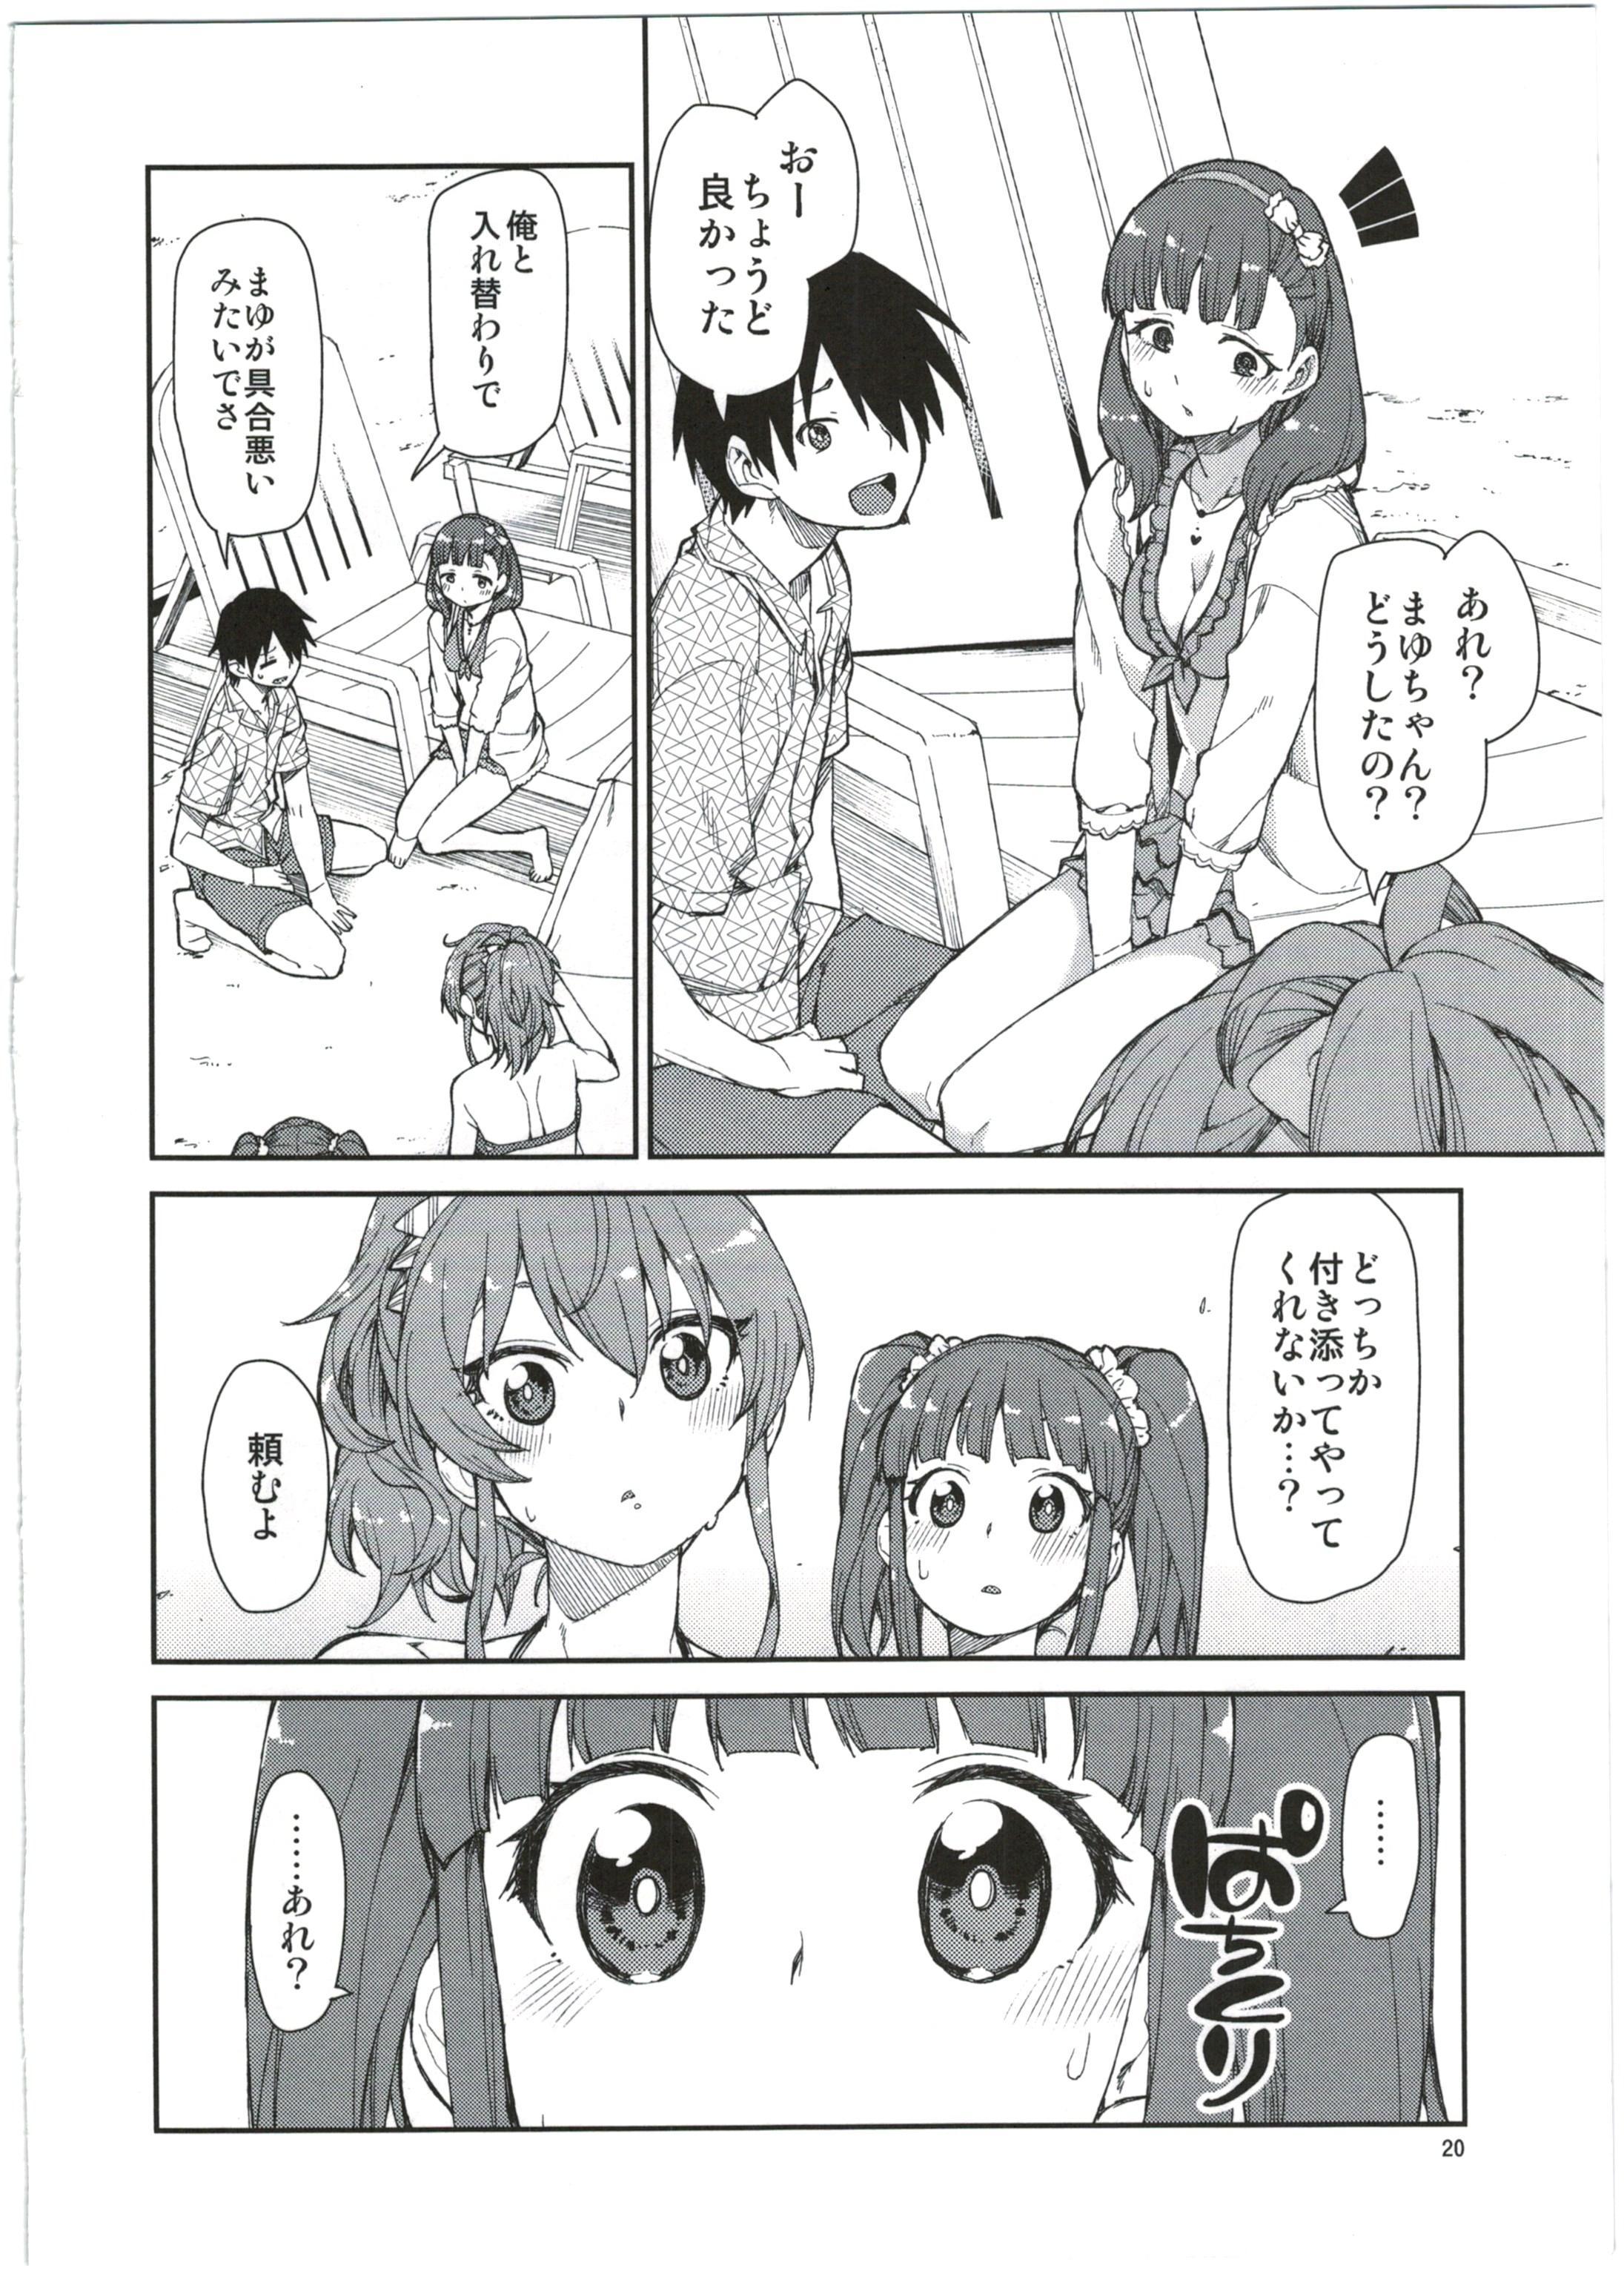 Mayu wa Ima Tottemo Shiawase 21